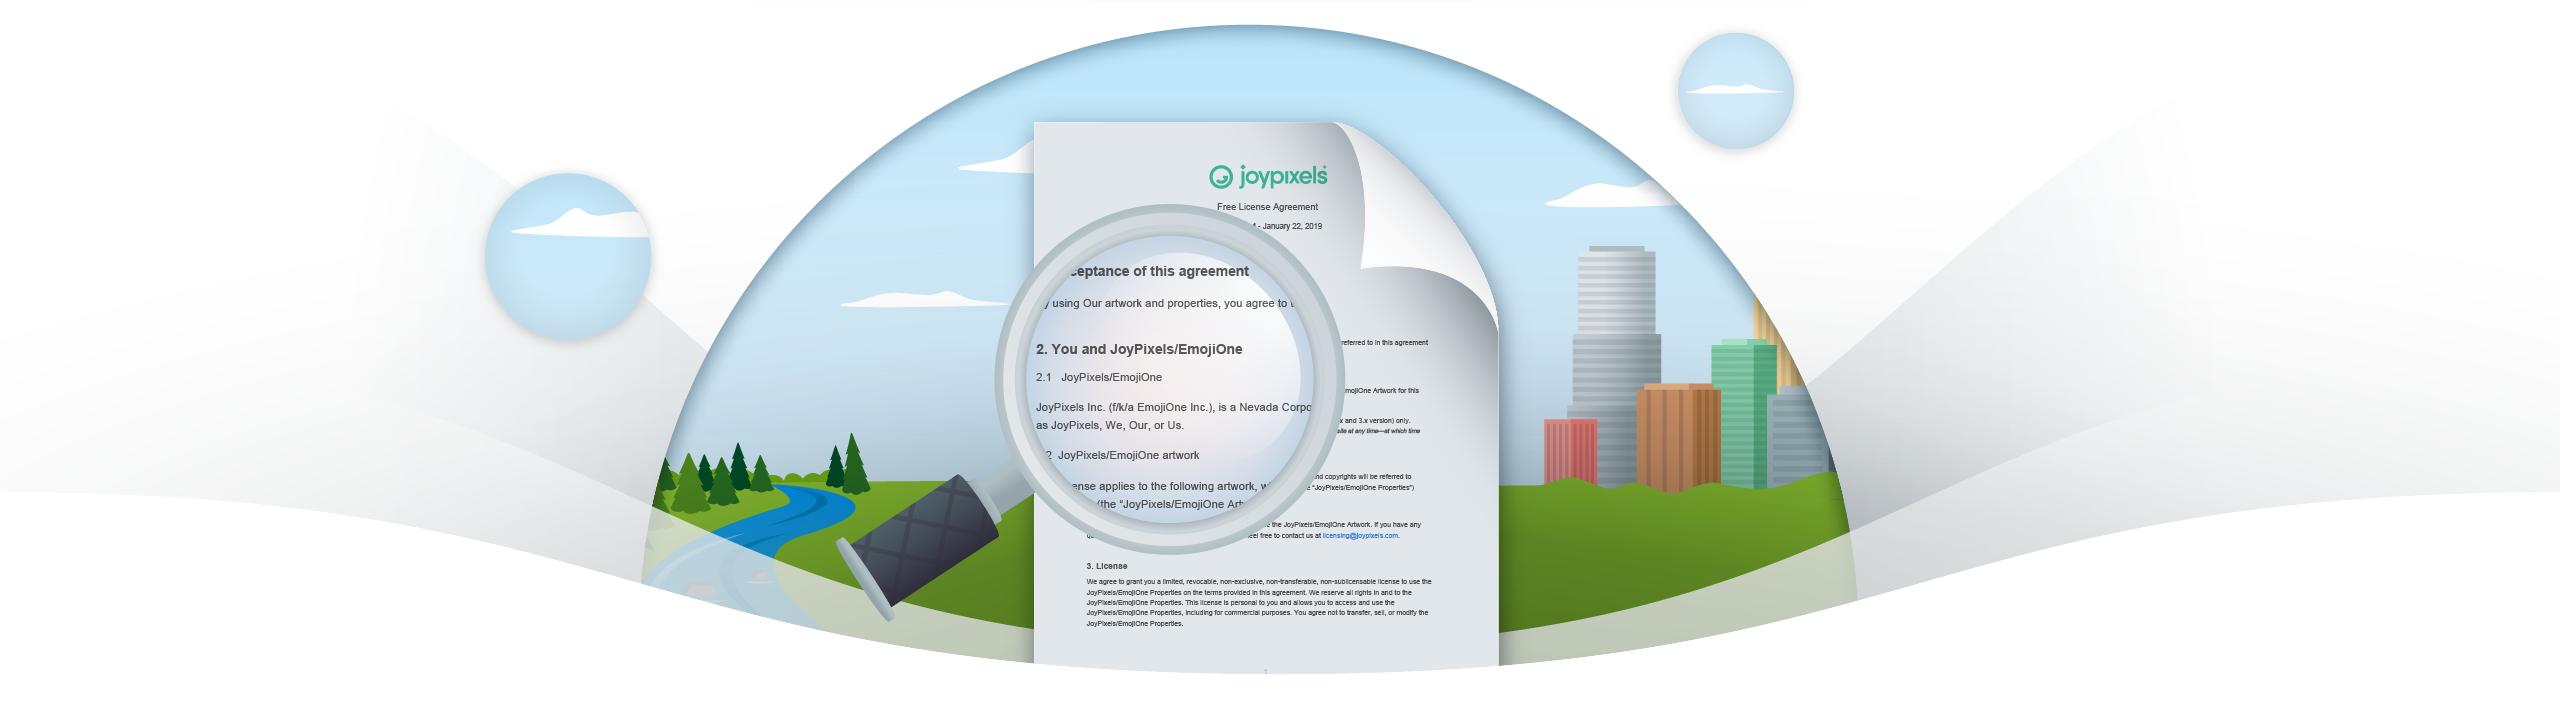 JoyPixels   Free Emoji License